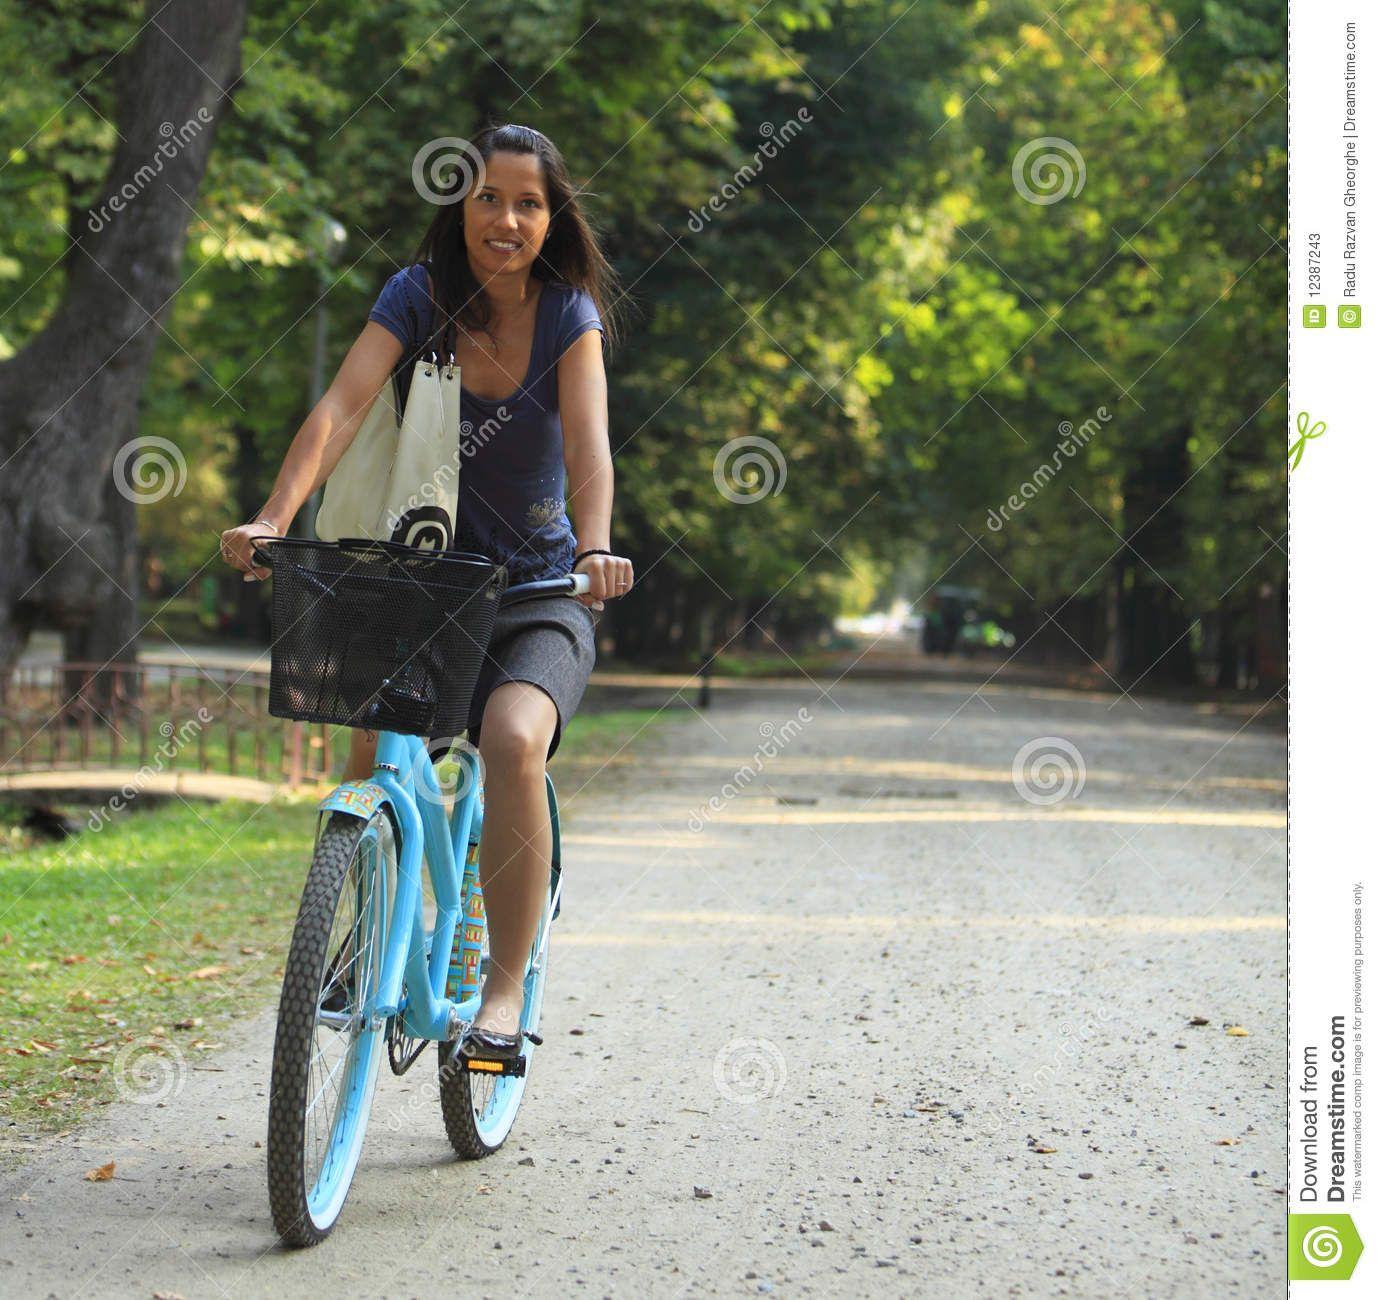 woman-riding-bicycle-12387243.jpg